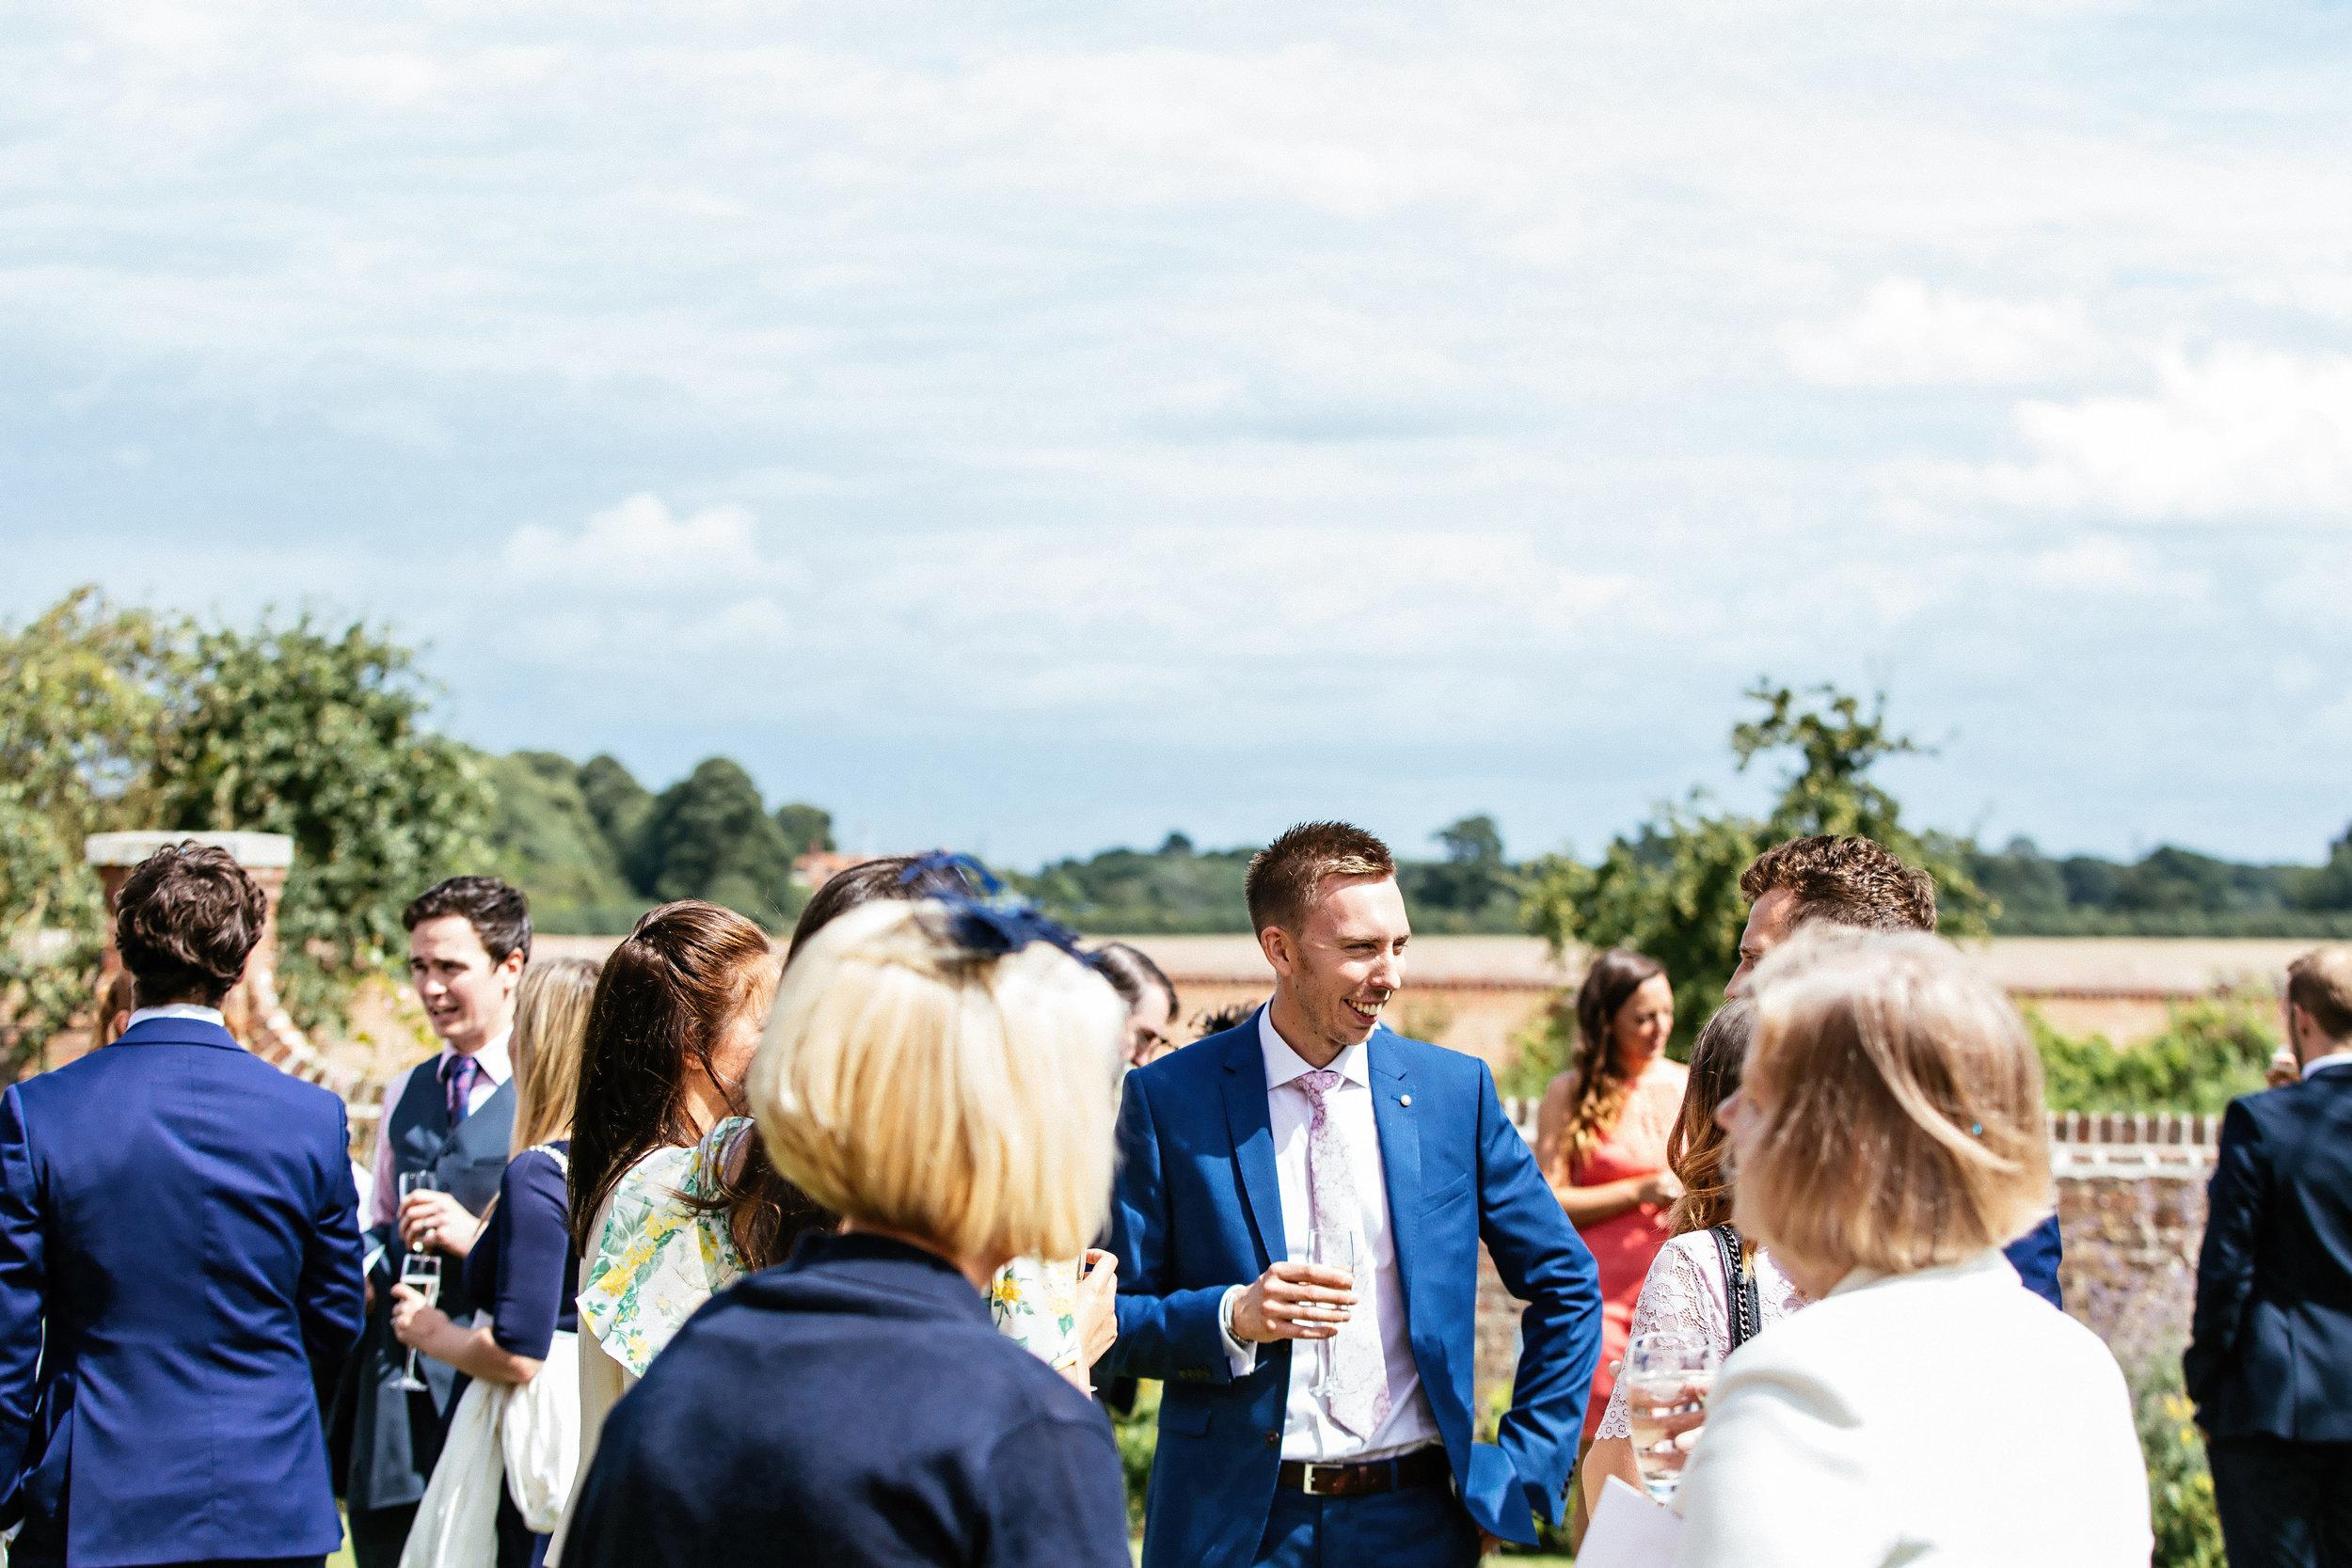 Tamara-and-Richard-Wedding-Highlights-37.jpg